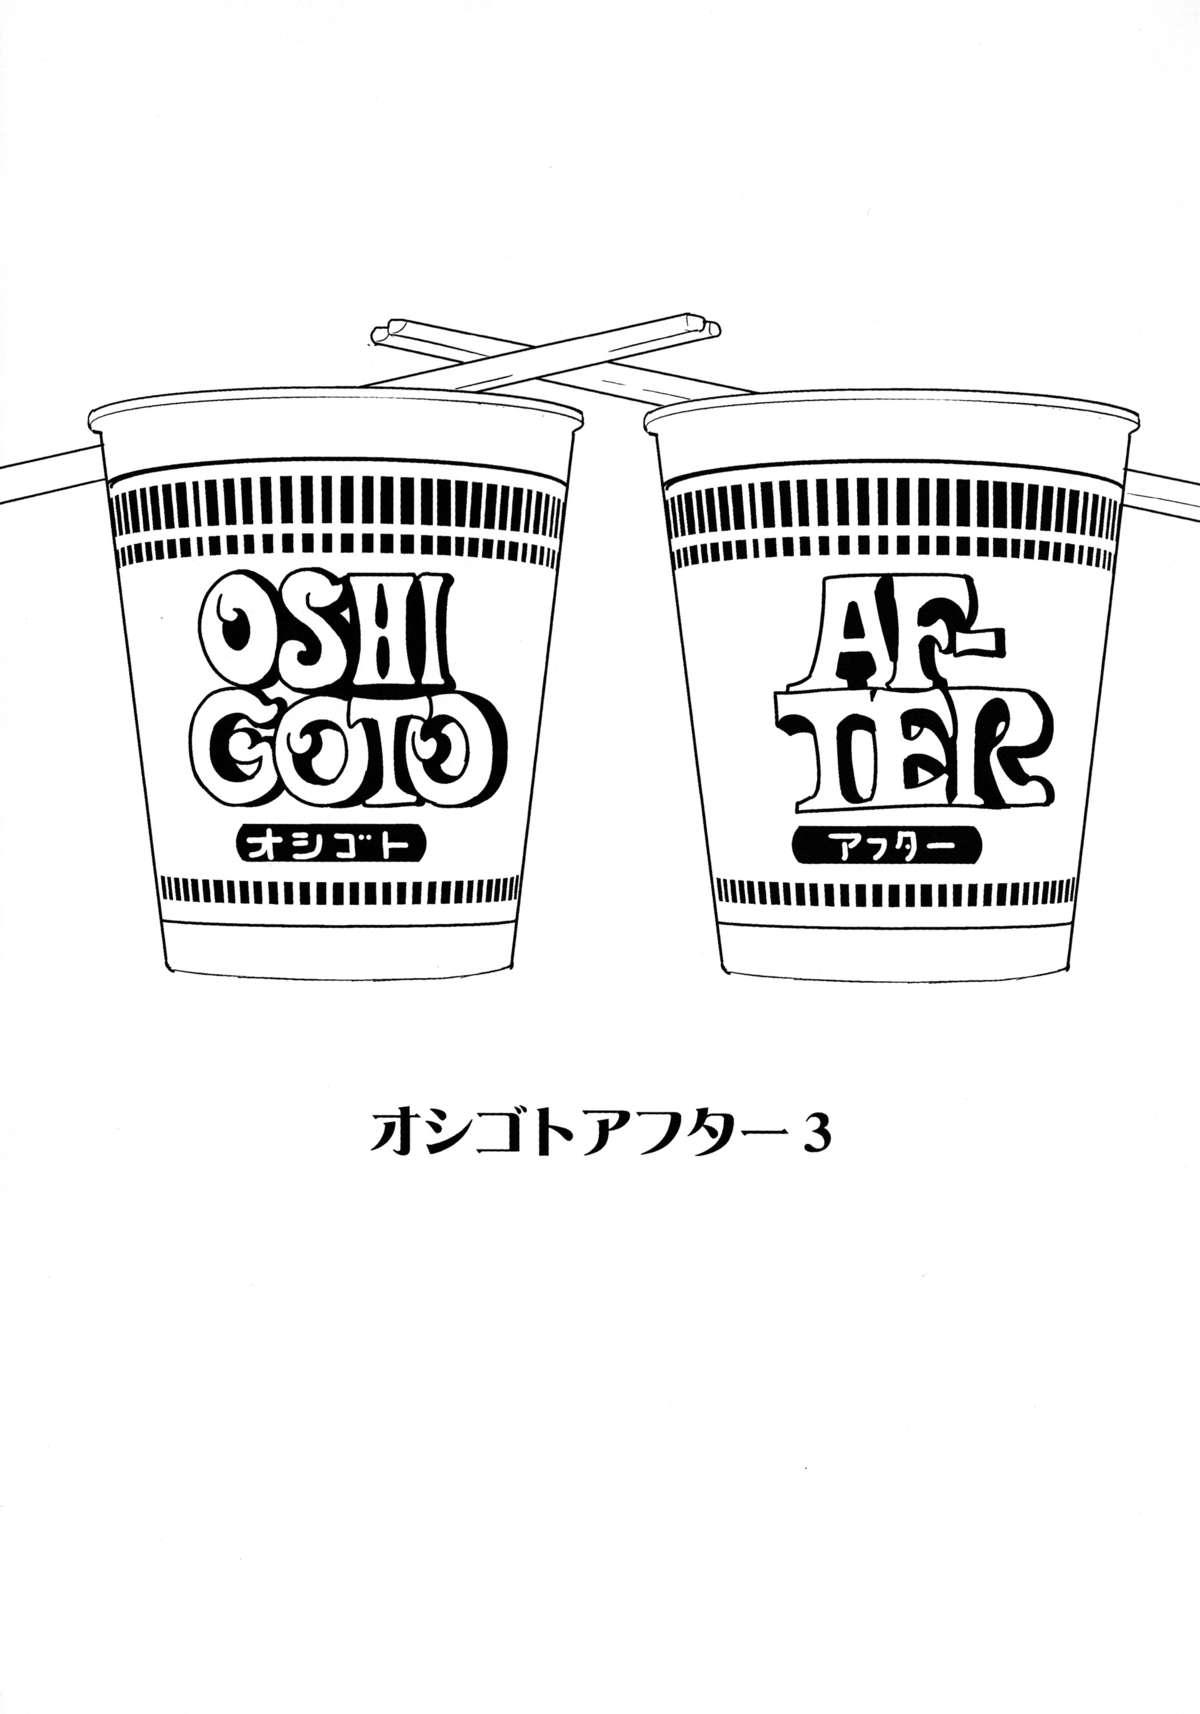 Oshigoto Master 41